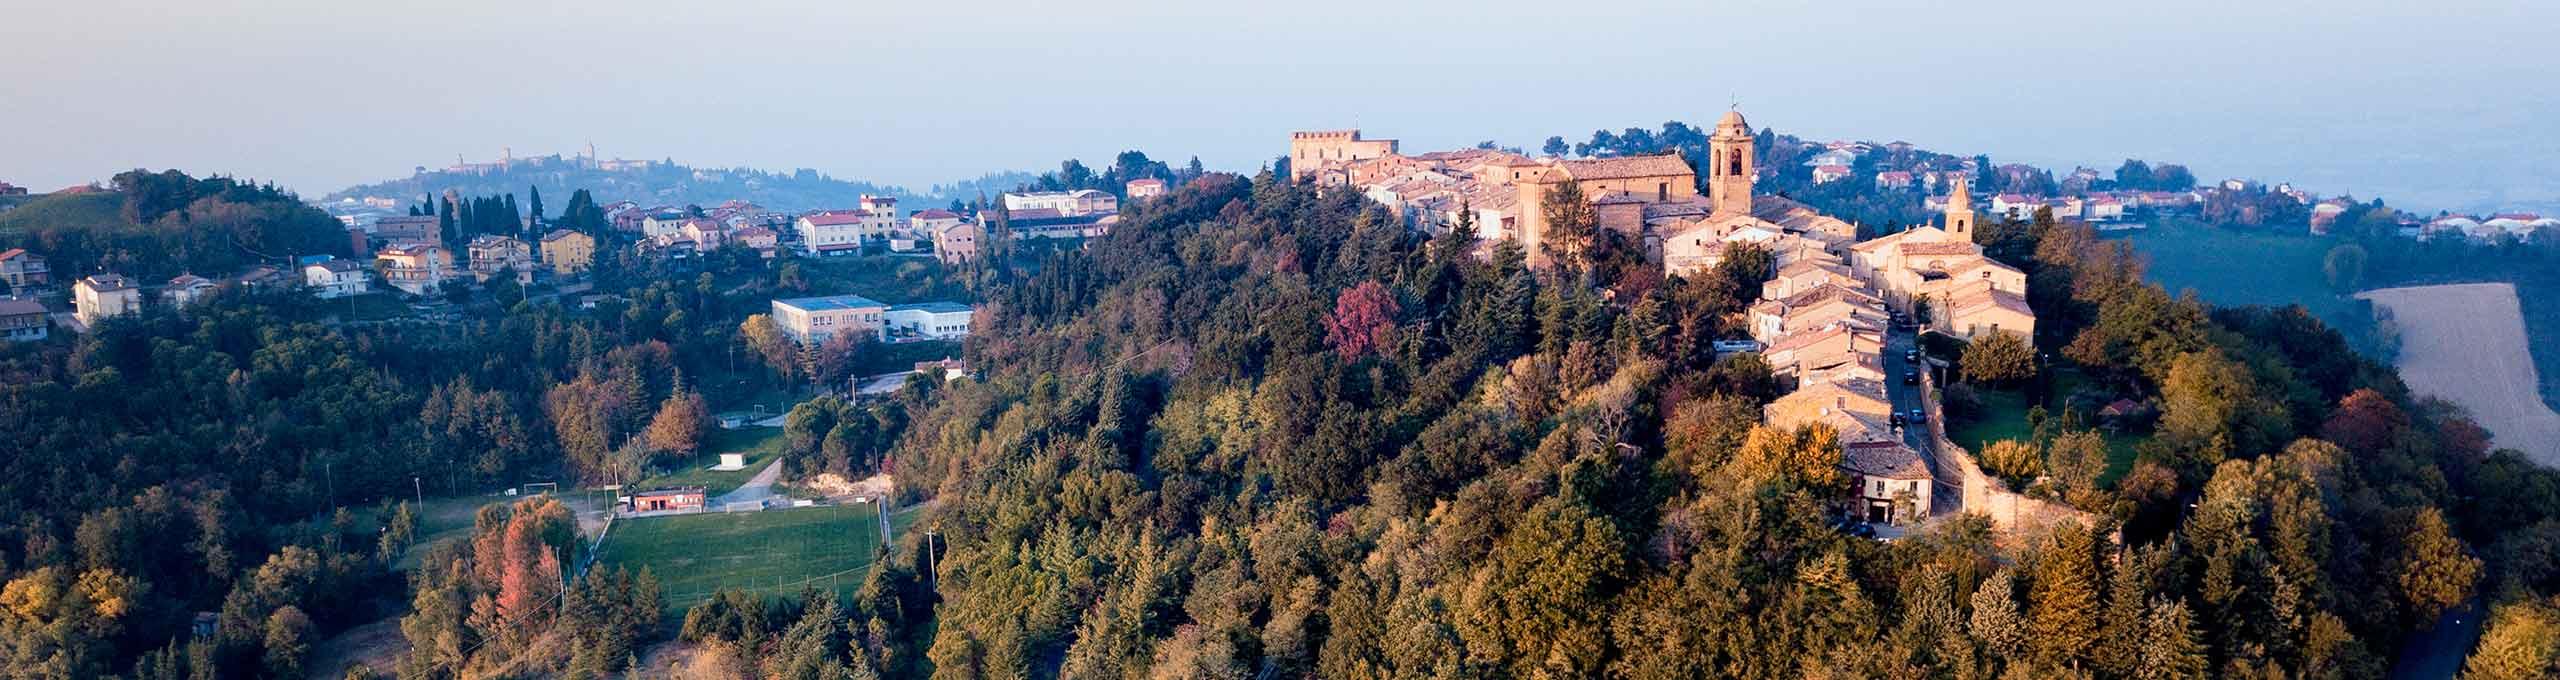 Mondaino, Riviera Romagnola, borgo medievale